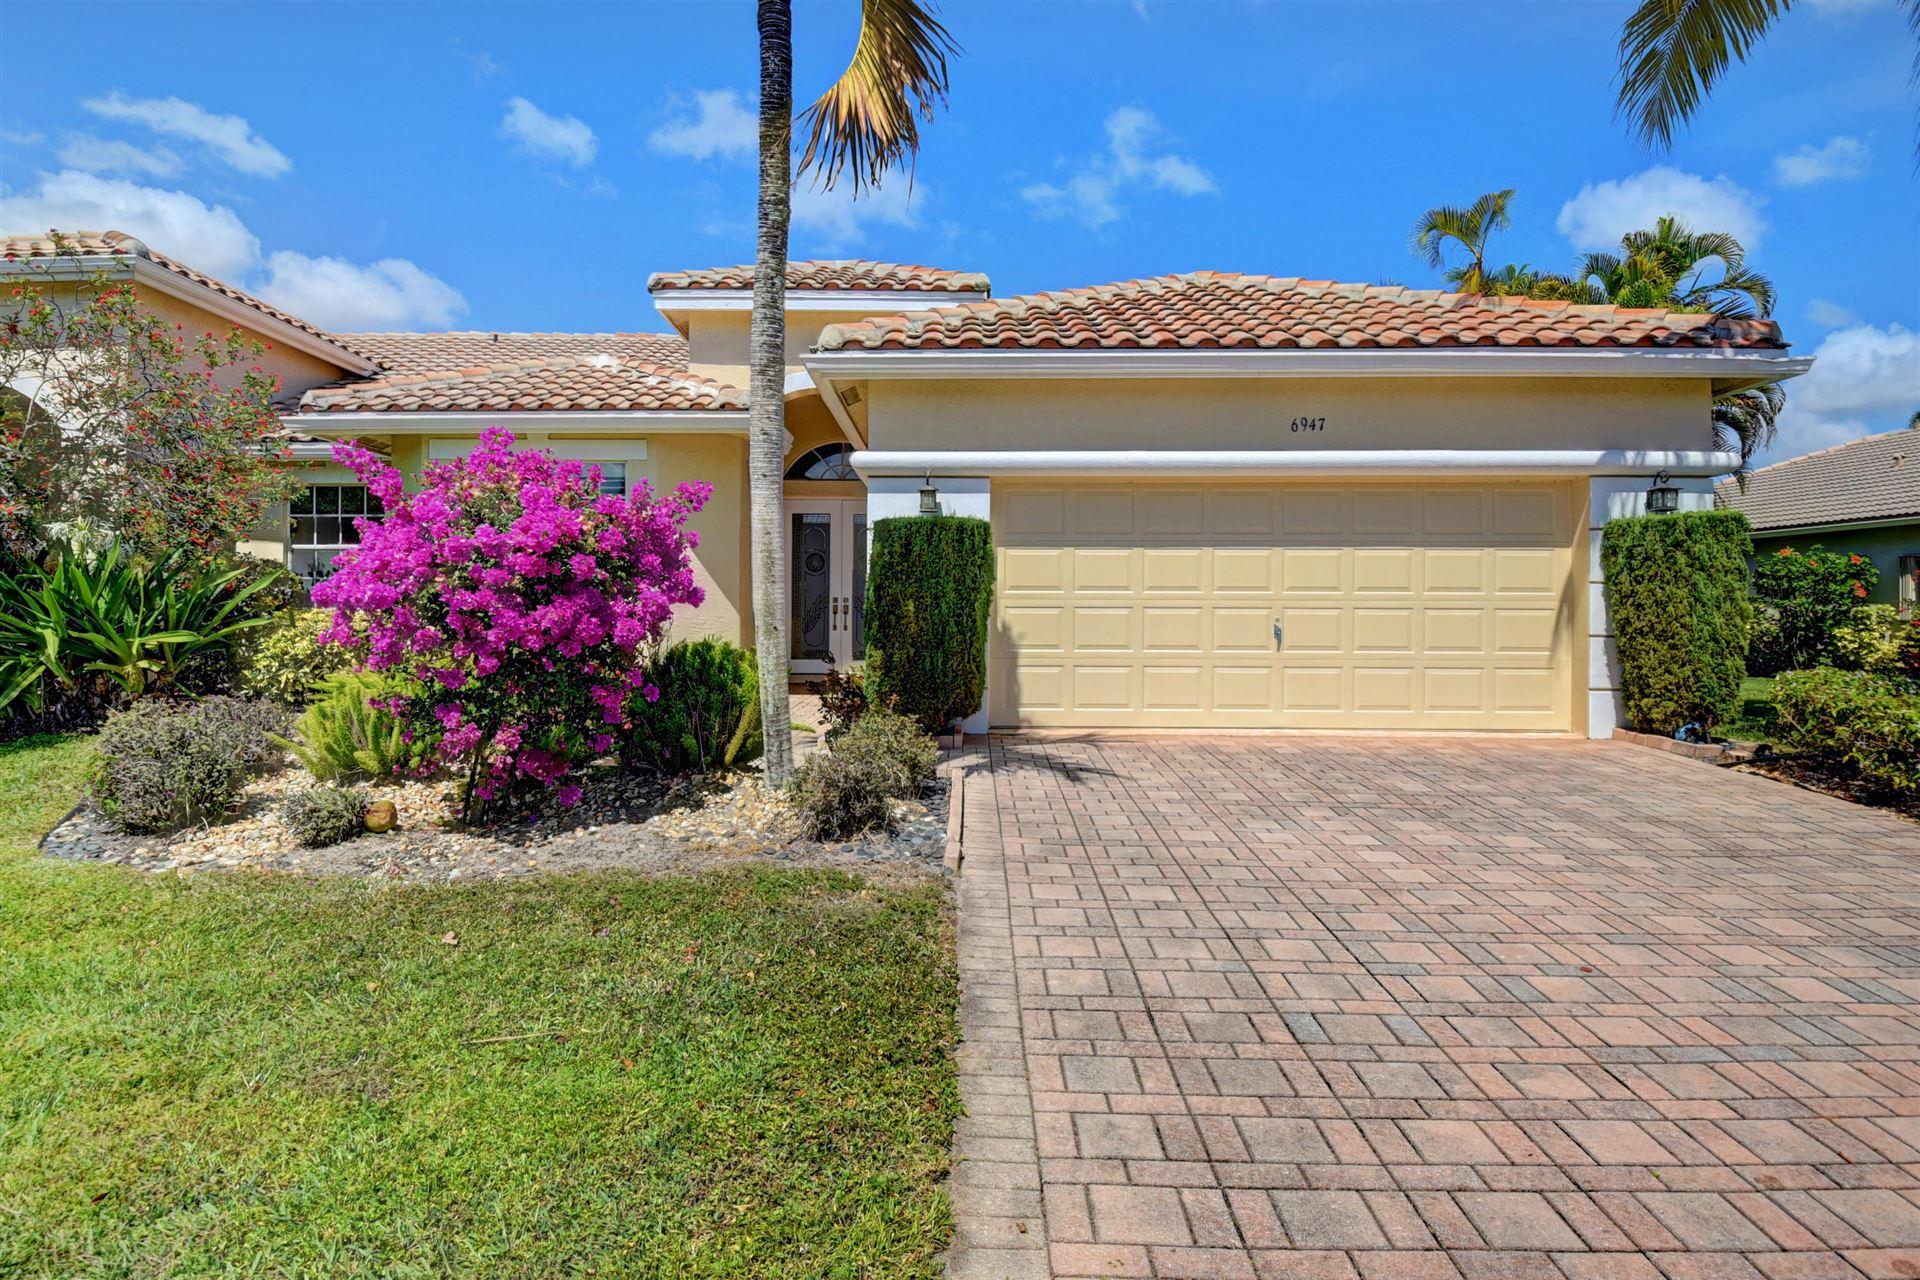 6947 Southport Drive, Boynton Beach, FL 33472 - #: RX-10609776